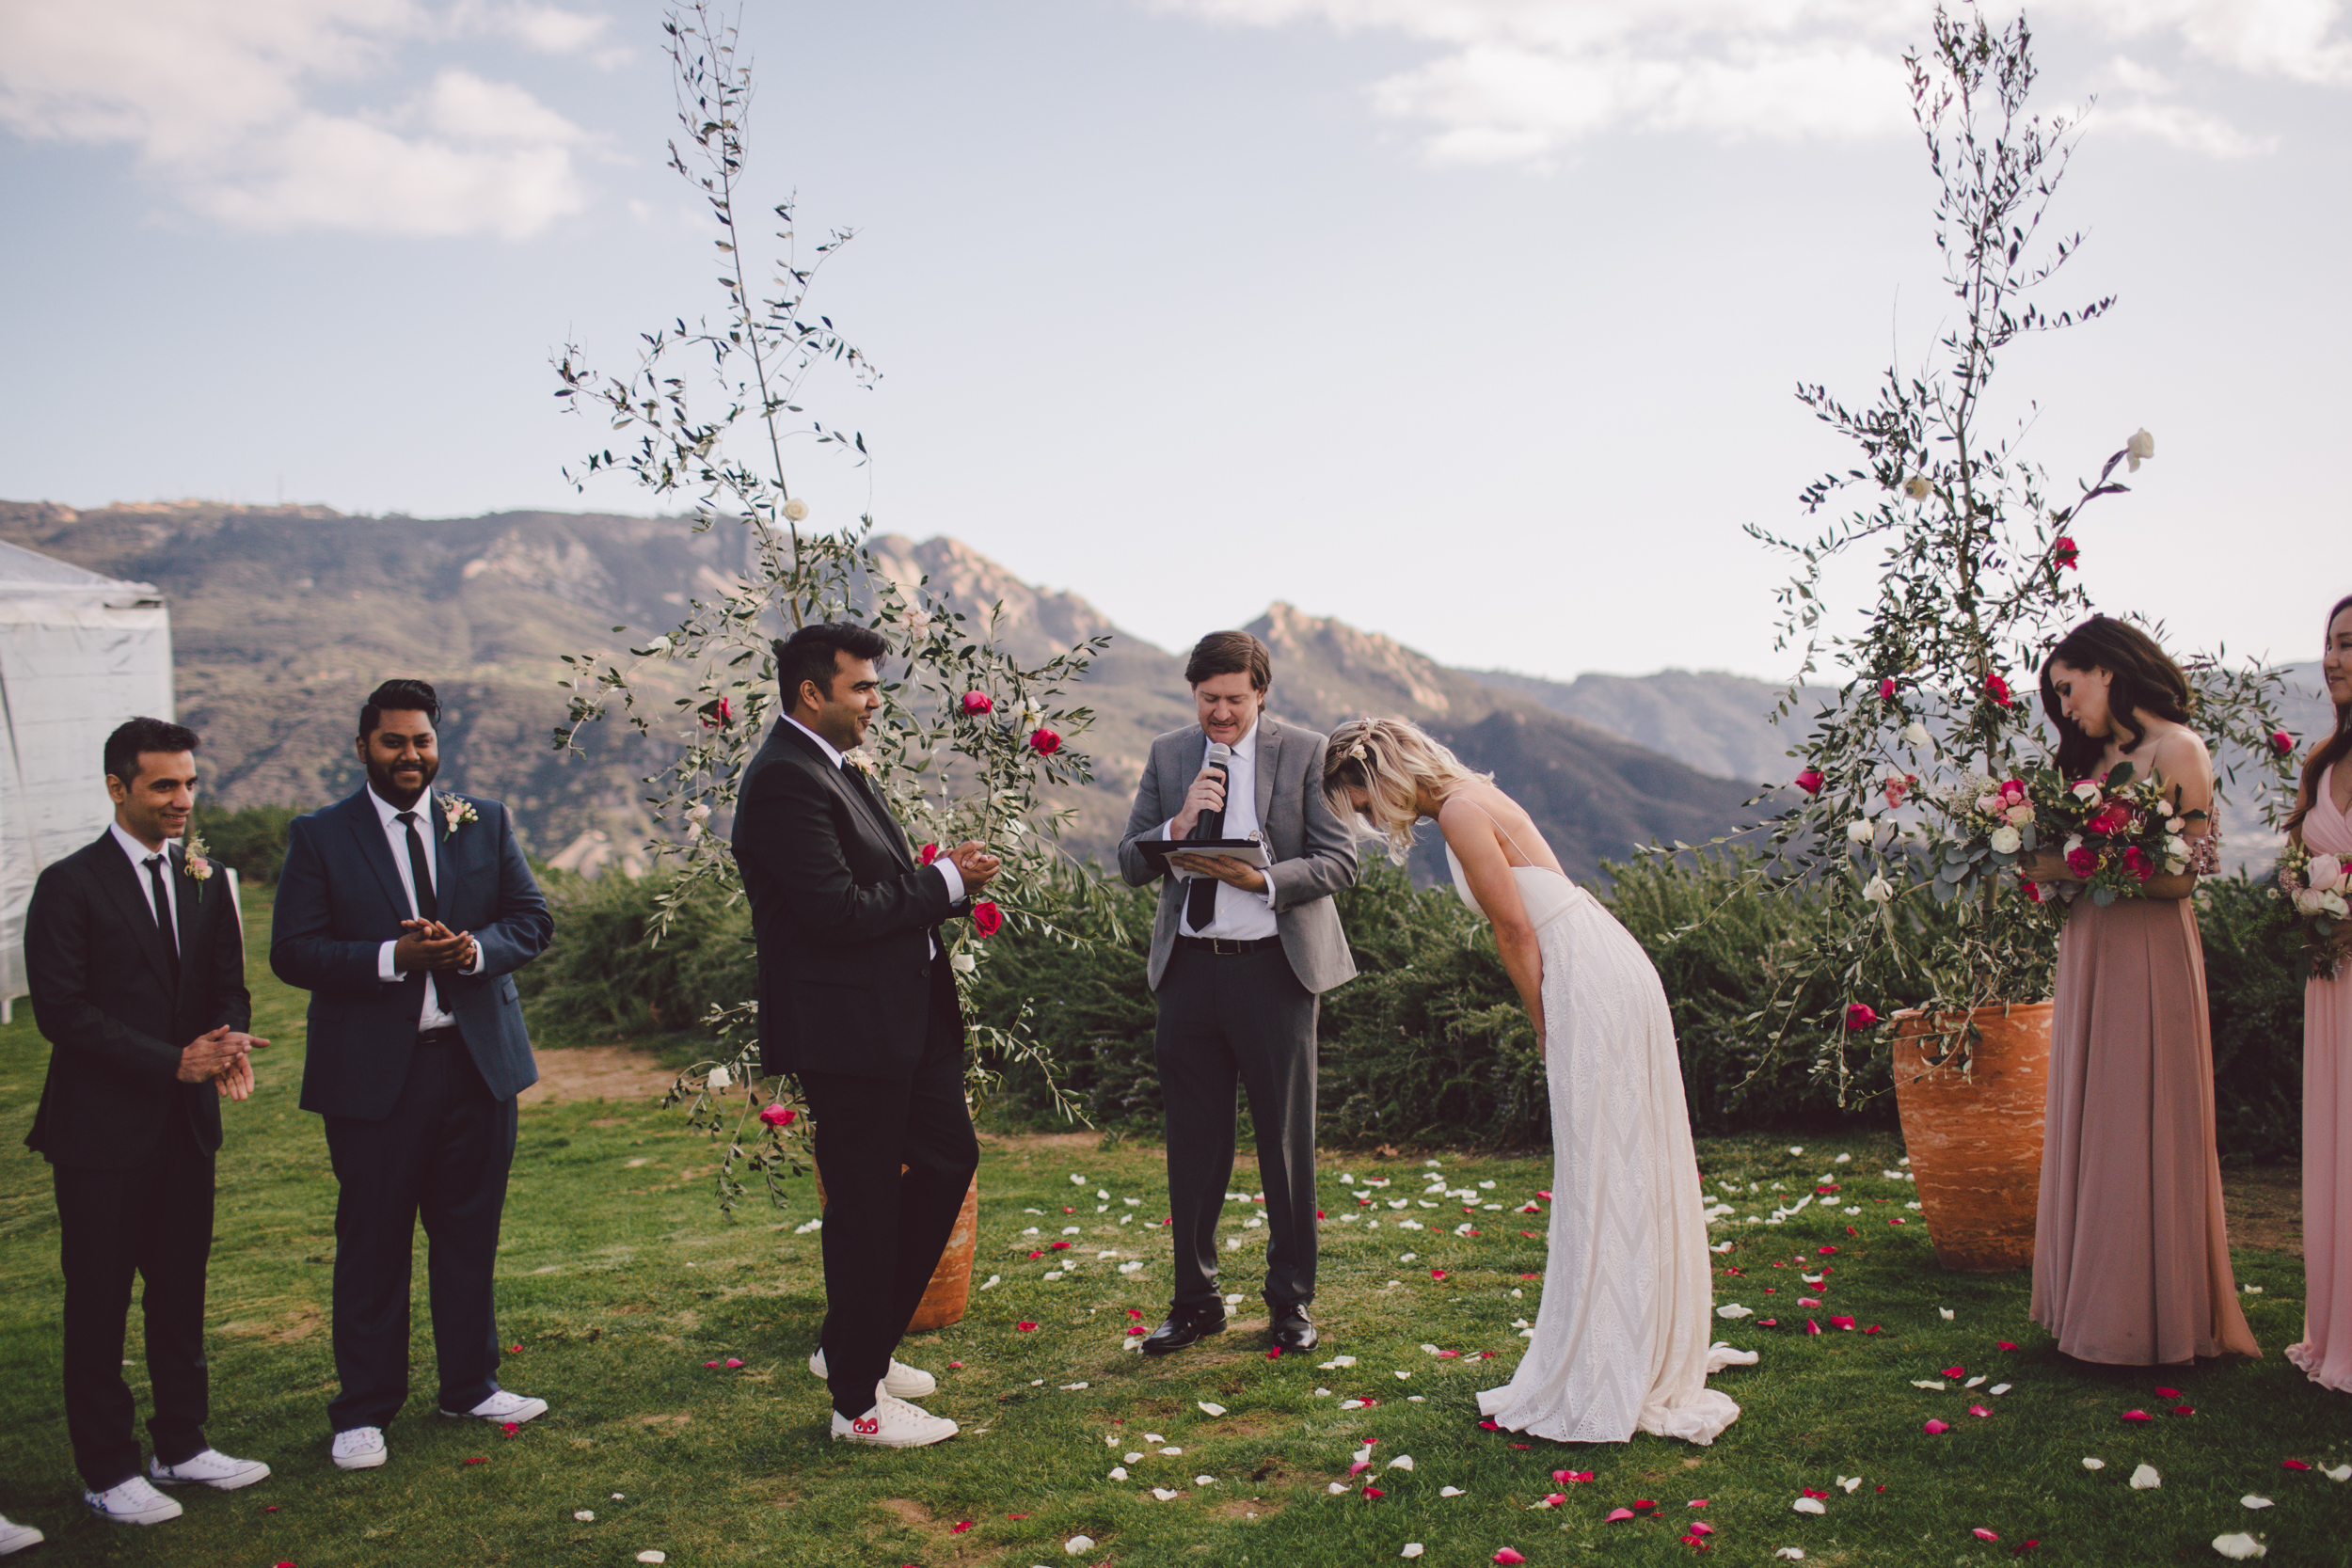 malibu-wedding-mountains-backyard-private estate